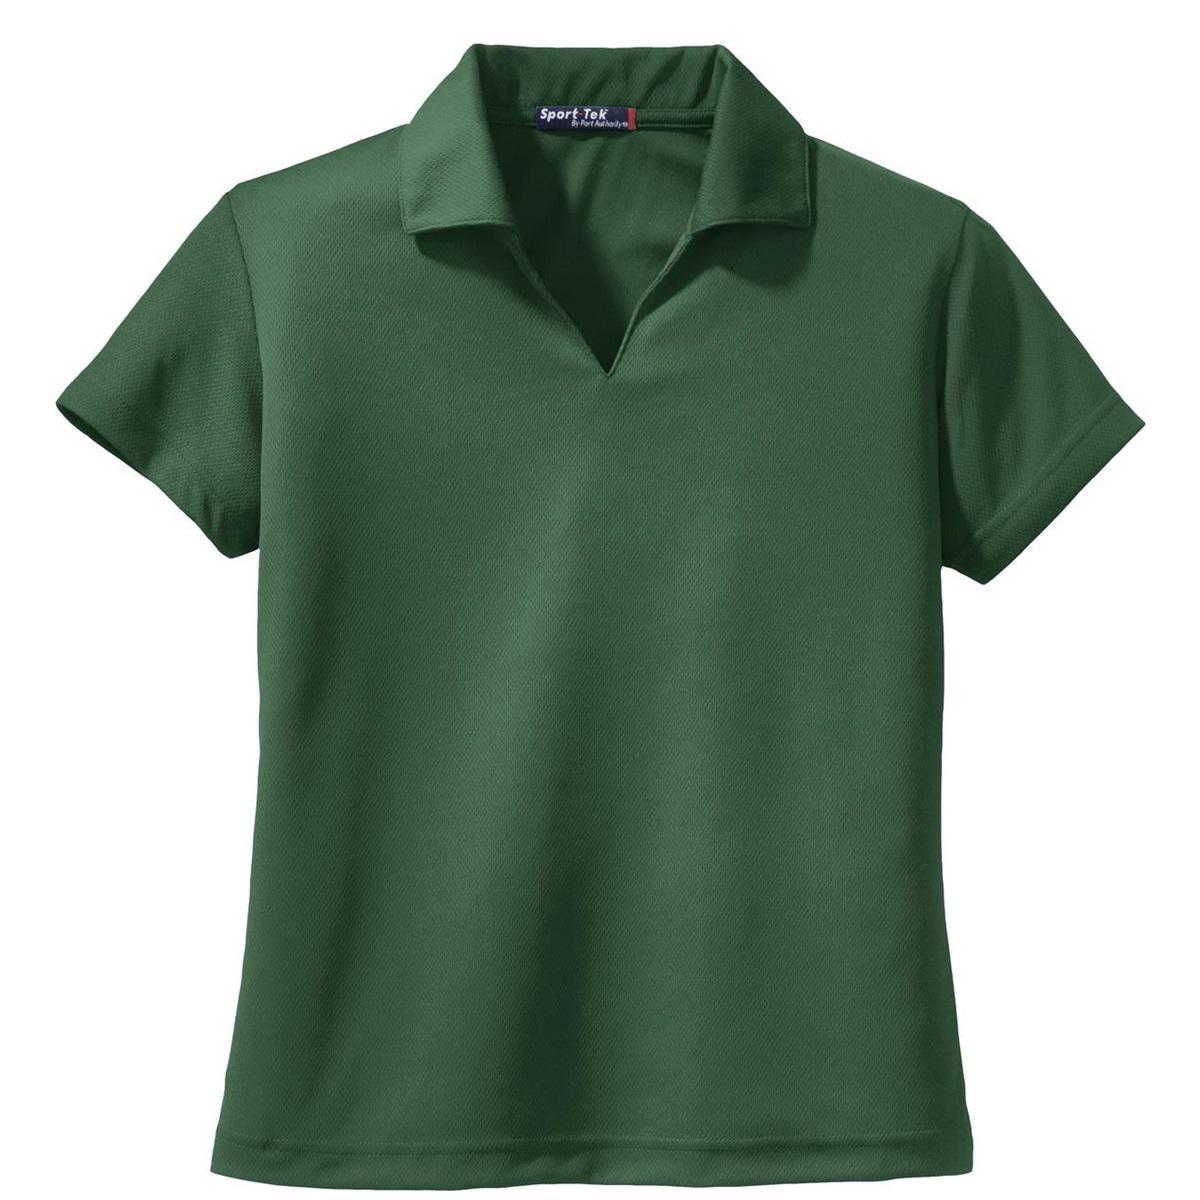 Sport Tek L469 Ladies V Neck Polo Shirt Forest Green